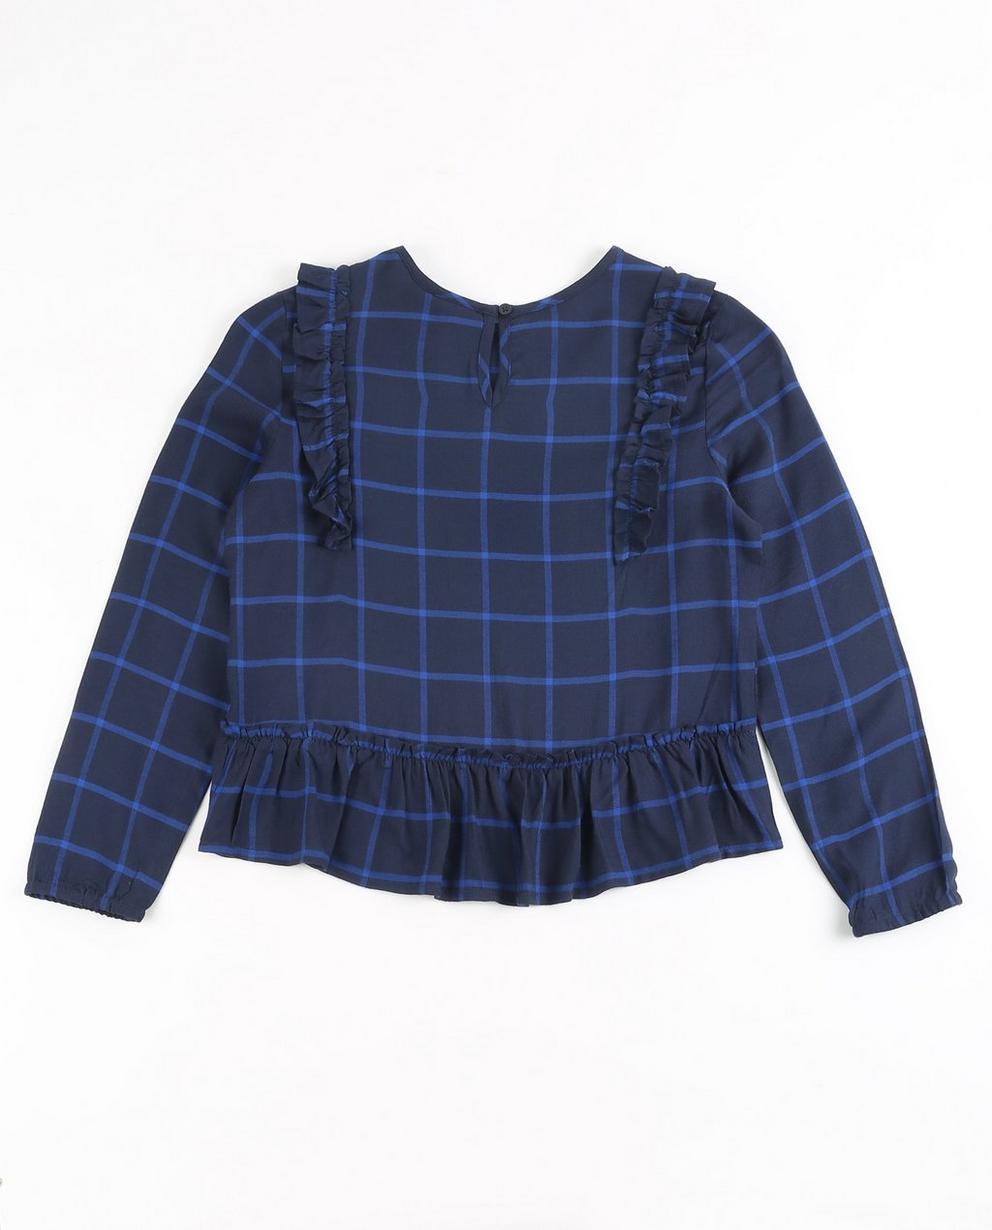 Hemden - Navy - Geruite blouse met ruches